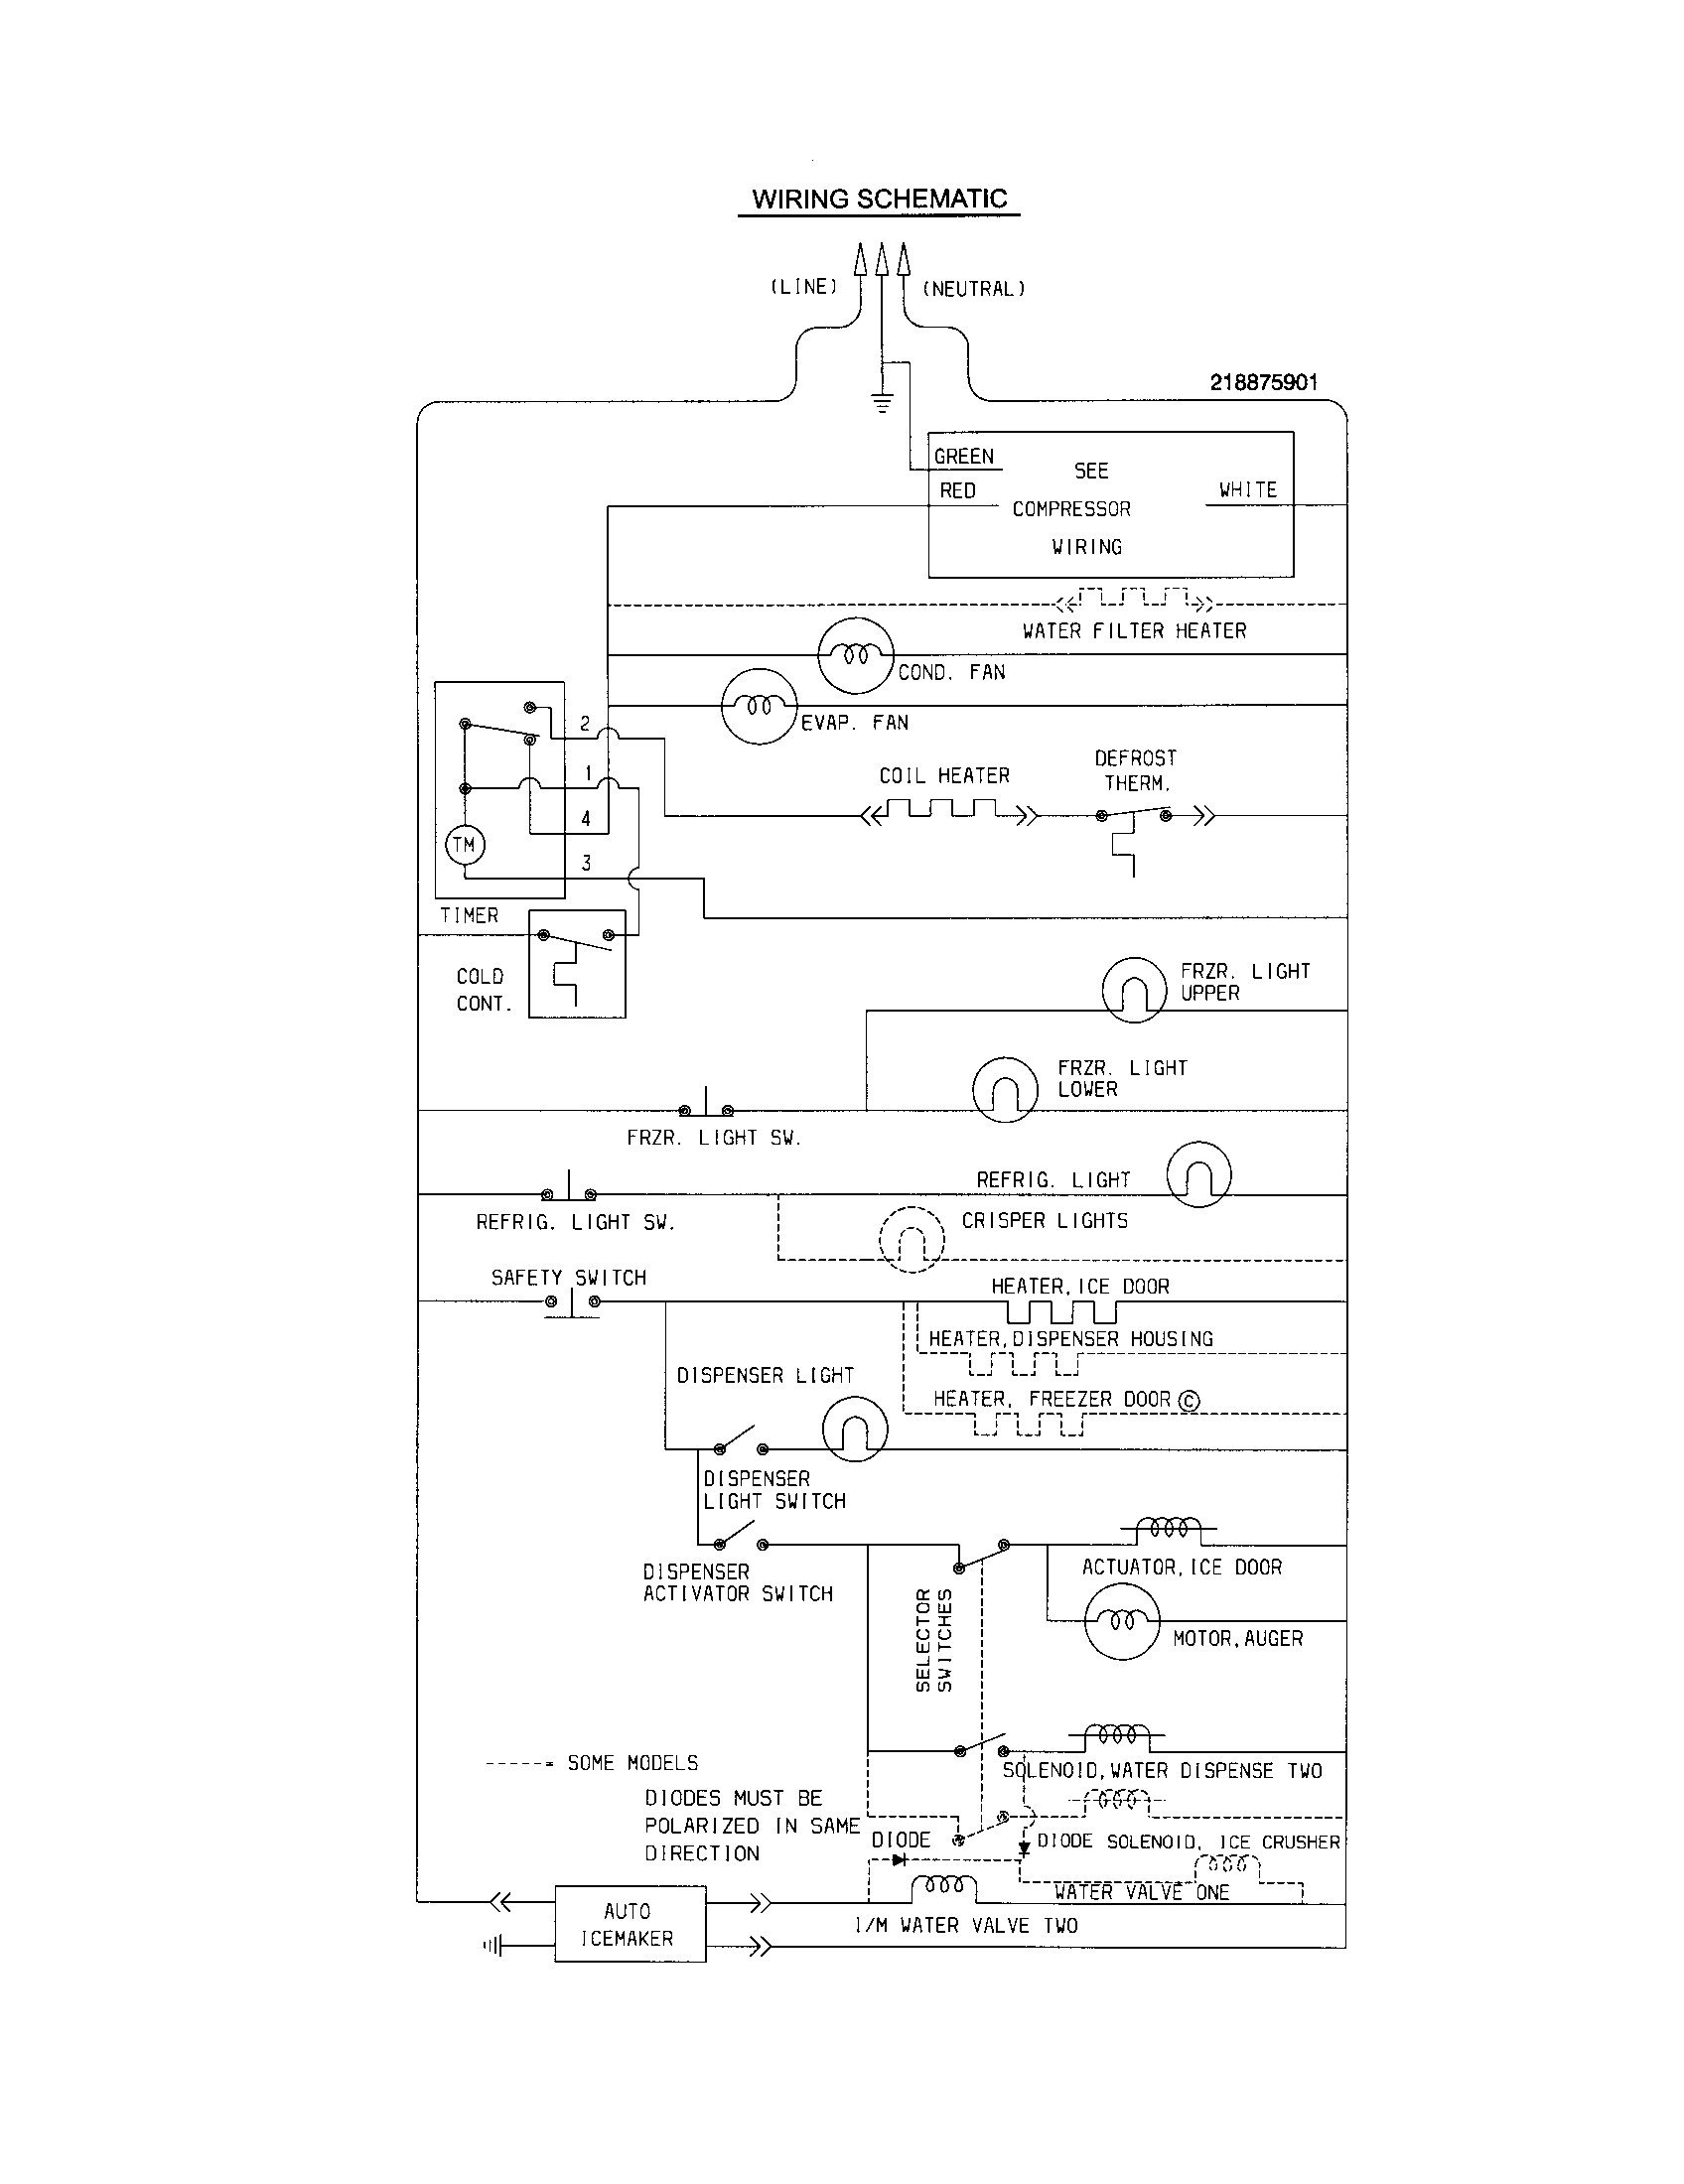 sears refrigerator wiring diagram 596 75533400 car fuse box wiring rh pokerchamps co Frigidaire Gallery Refrigerator Drain Frigidaire Side by Side Diagram